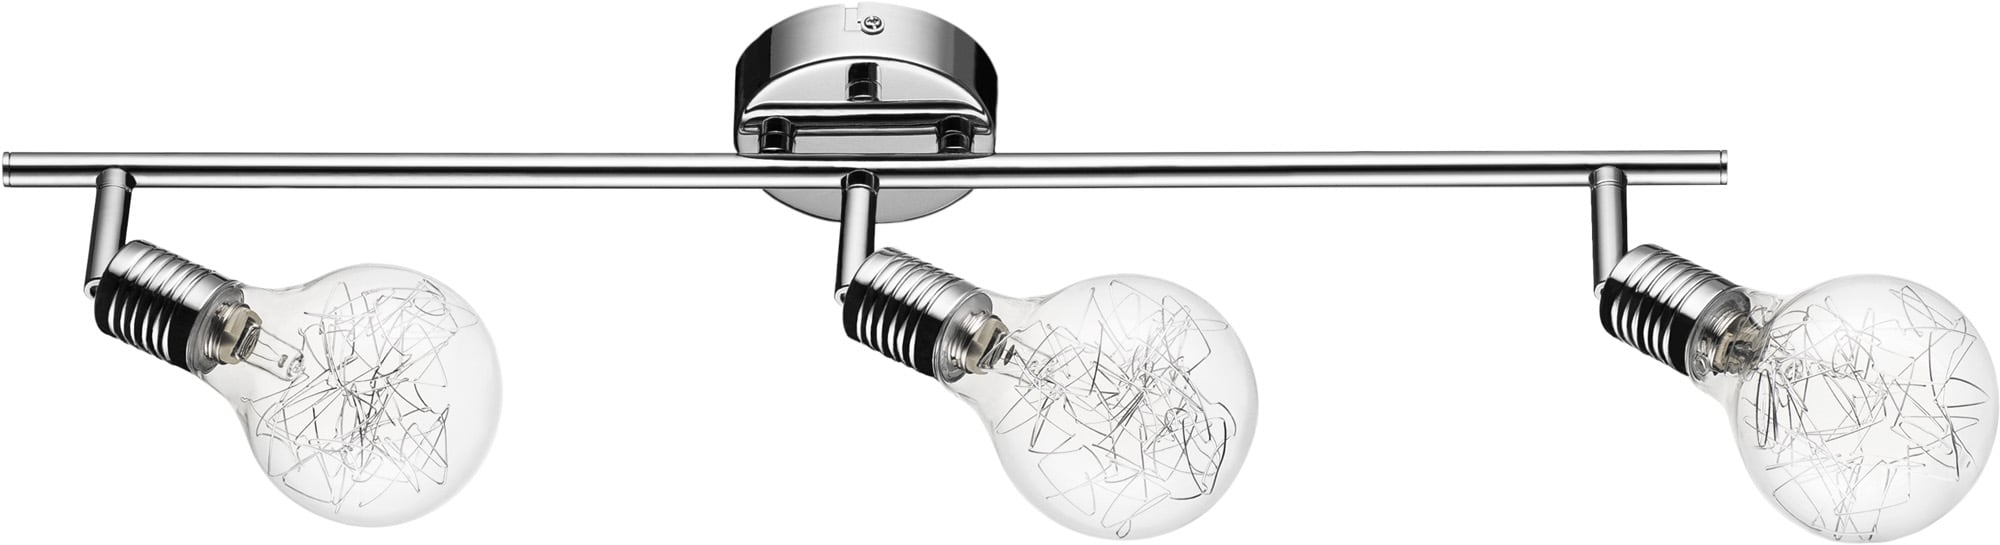 Nowoczesna Chromowana Listwa Plafon Spot Bulbs Szklane Kulki G9 28W